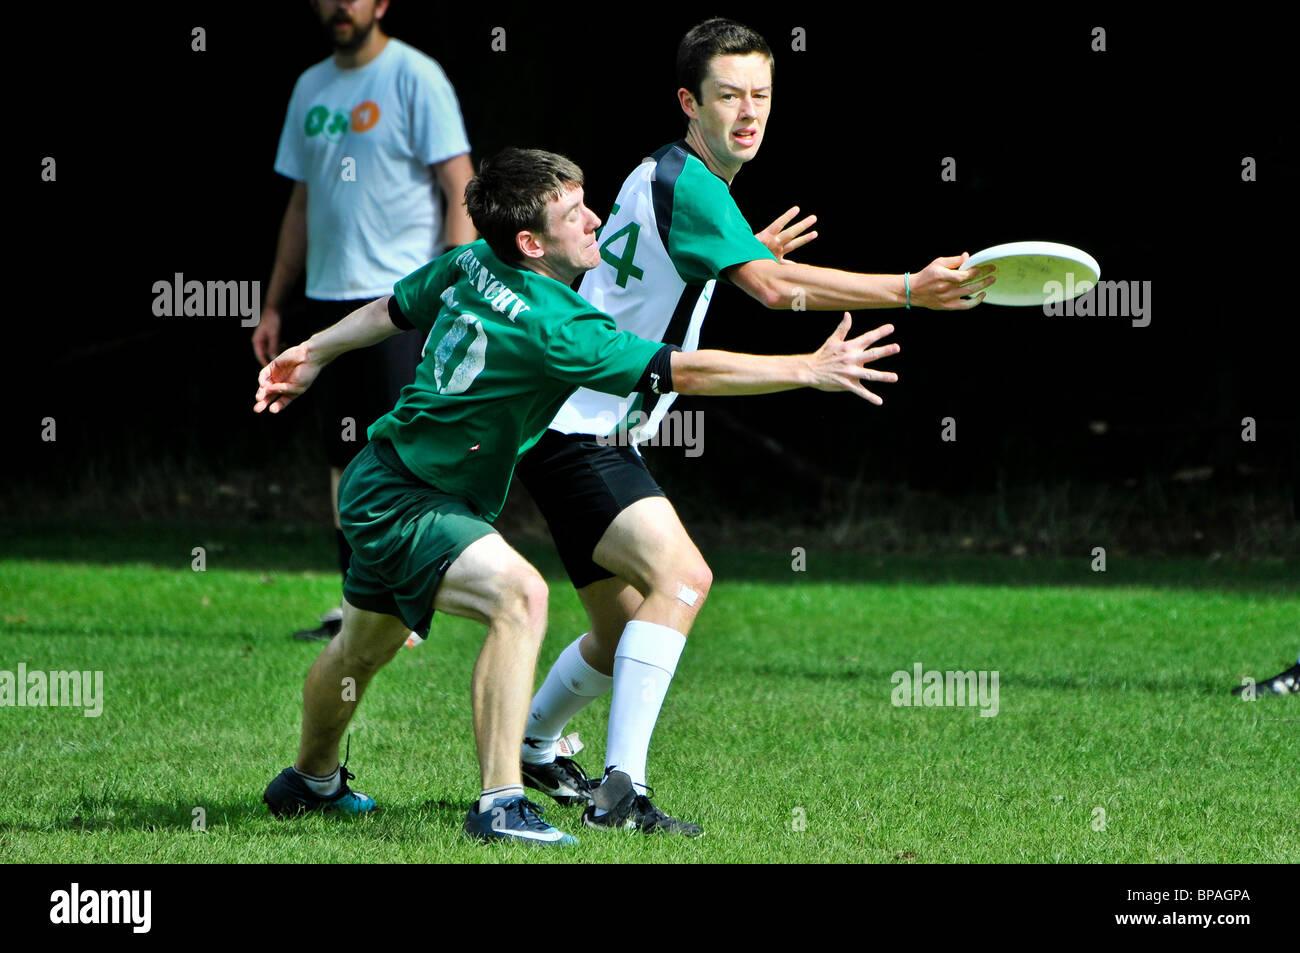 All Ireland Ultimate Frisbee Championships 2010. Belfast, 22/08/2010 - Stock Image